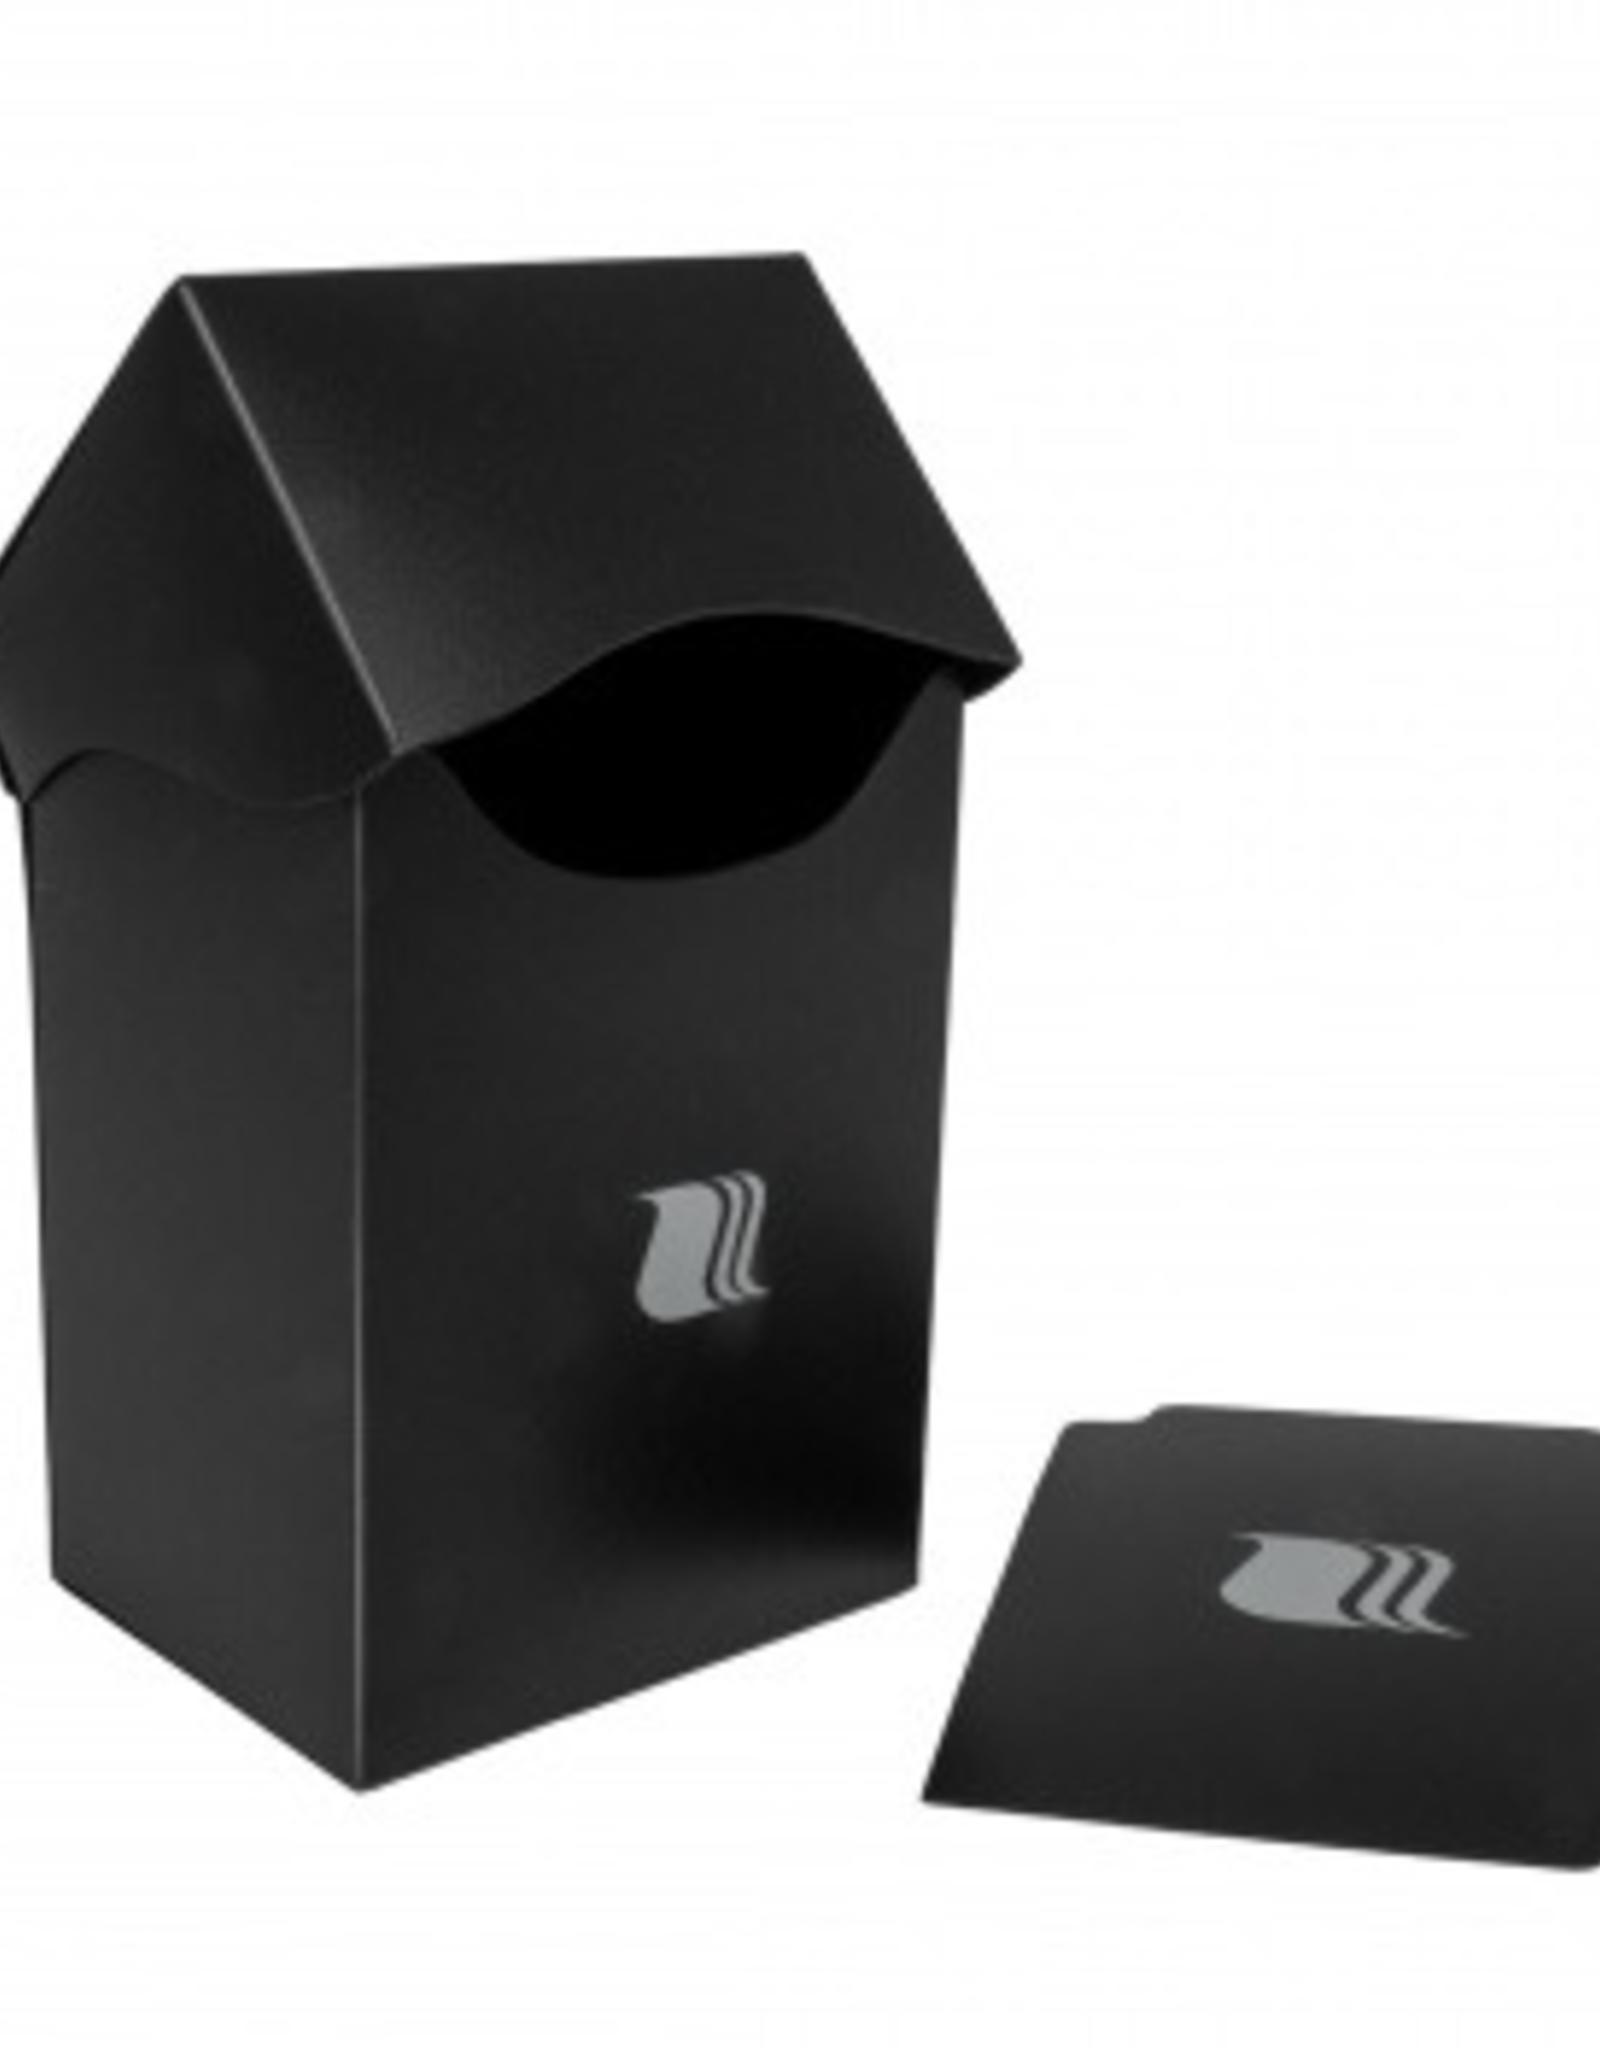 BF - Zubehör Blackfire Deck Holder Vertical - for 80+ Cards - Black